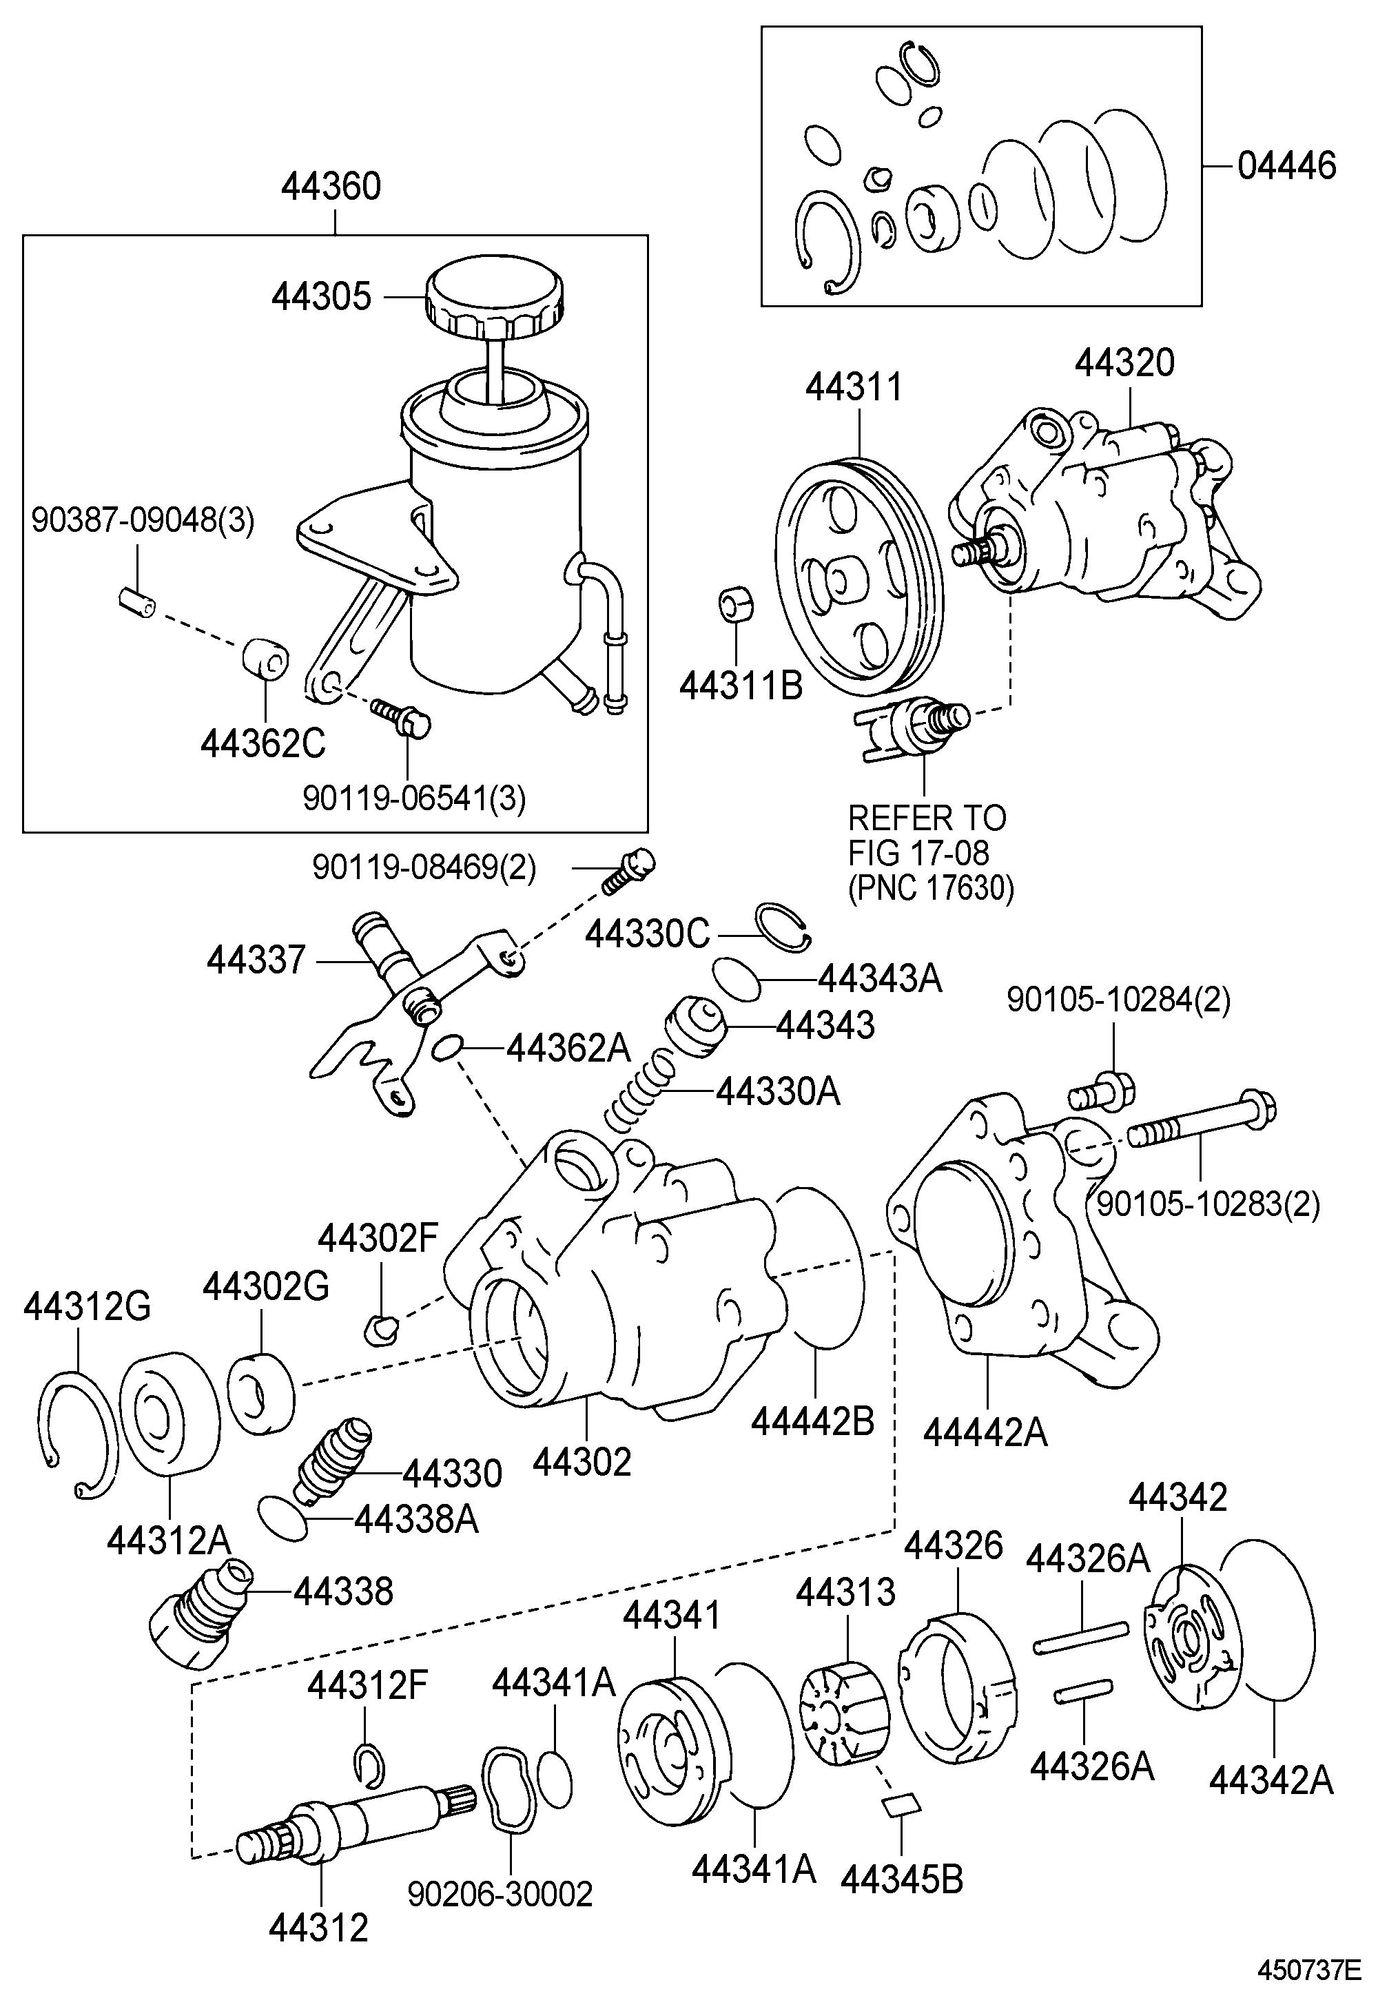 Exploded lexus parts diagram of 1998 ls400 p s pump internals lexus shop manual and parts list outlines the individual pump vanes are tolerance specific